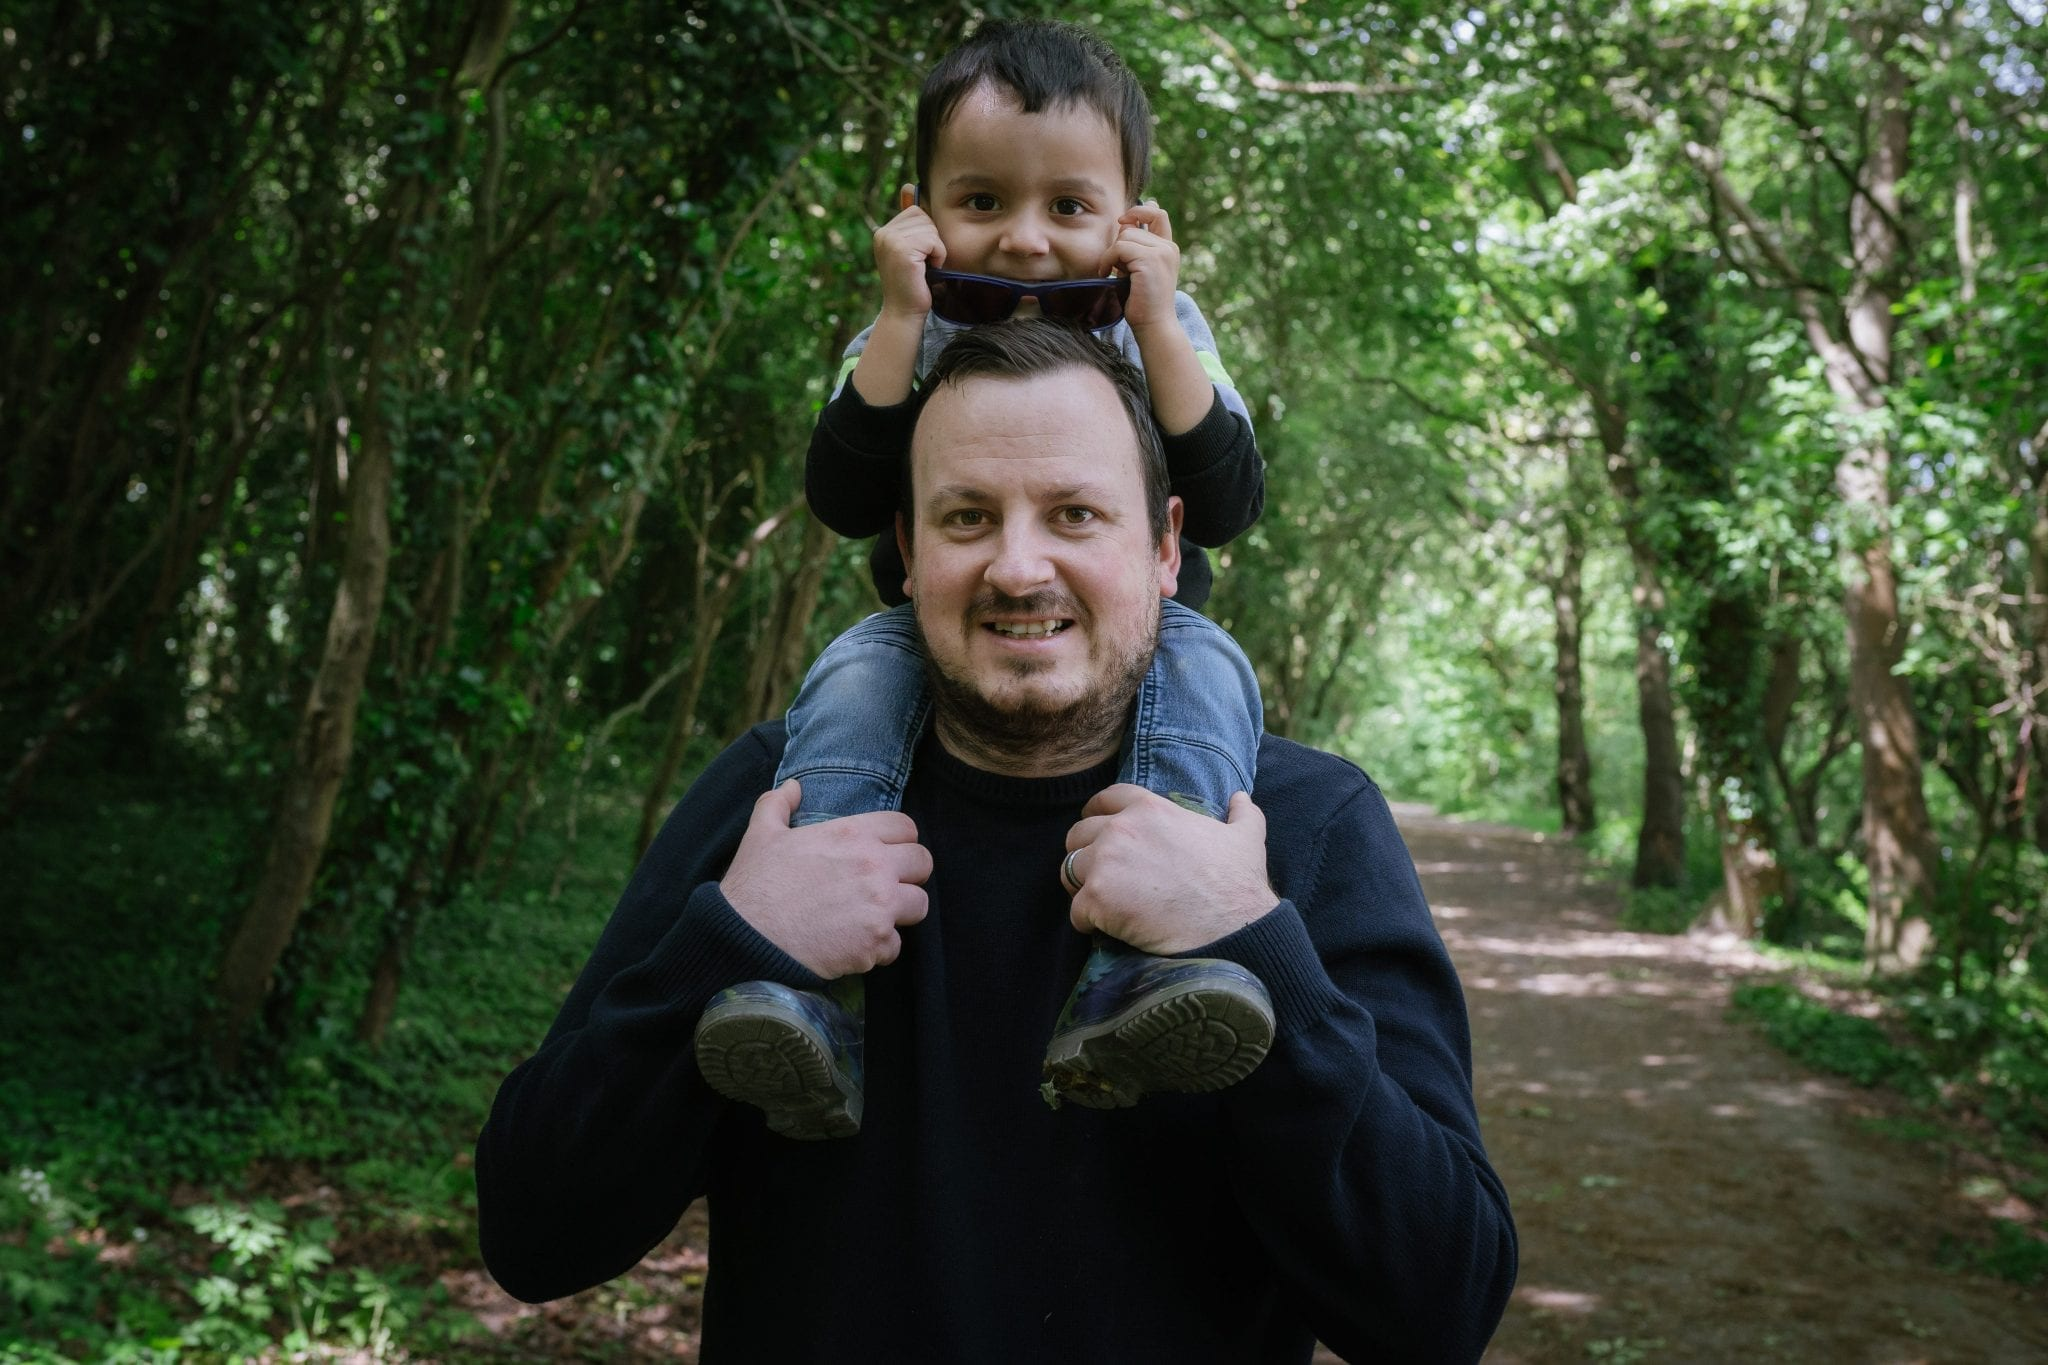 Family Photoshoot - Father & Son